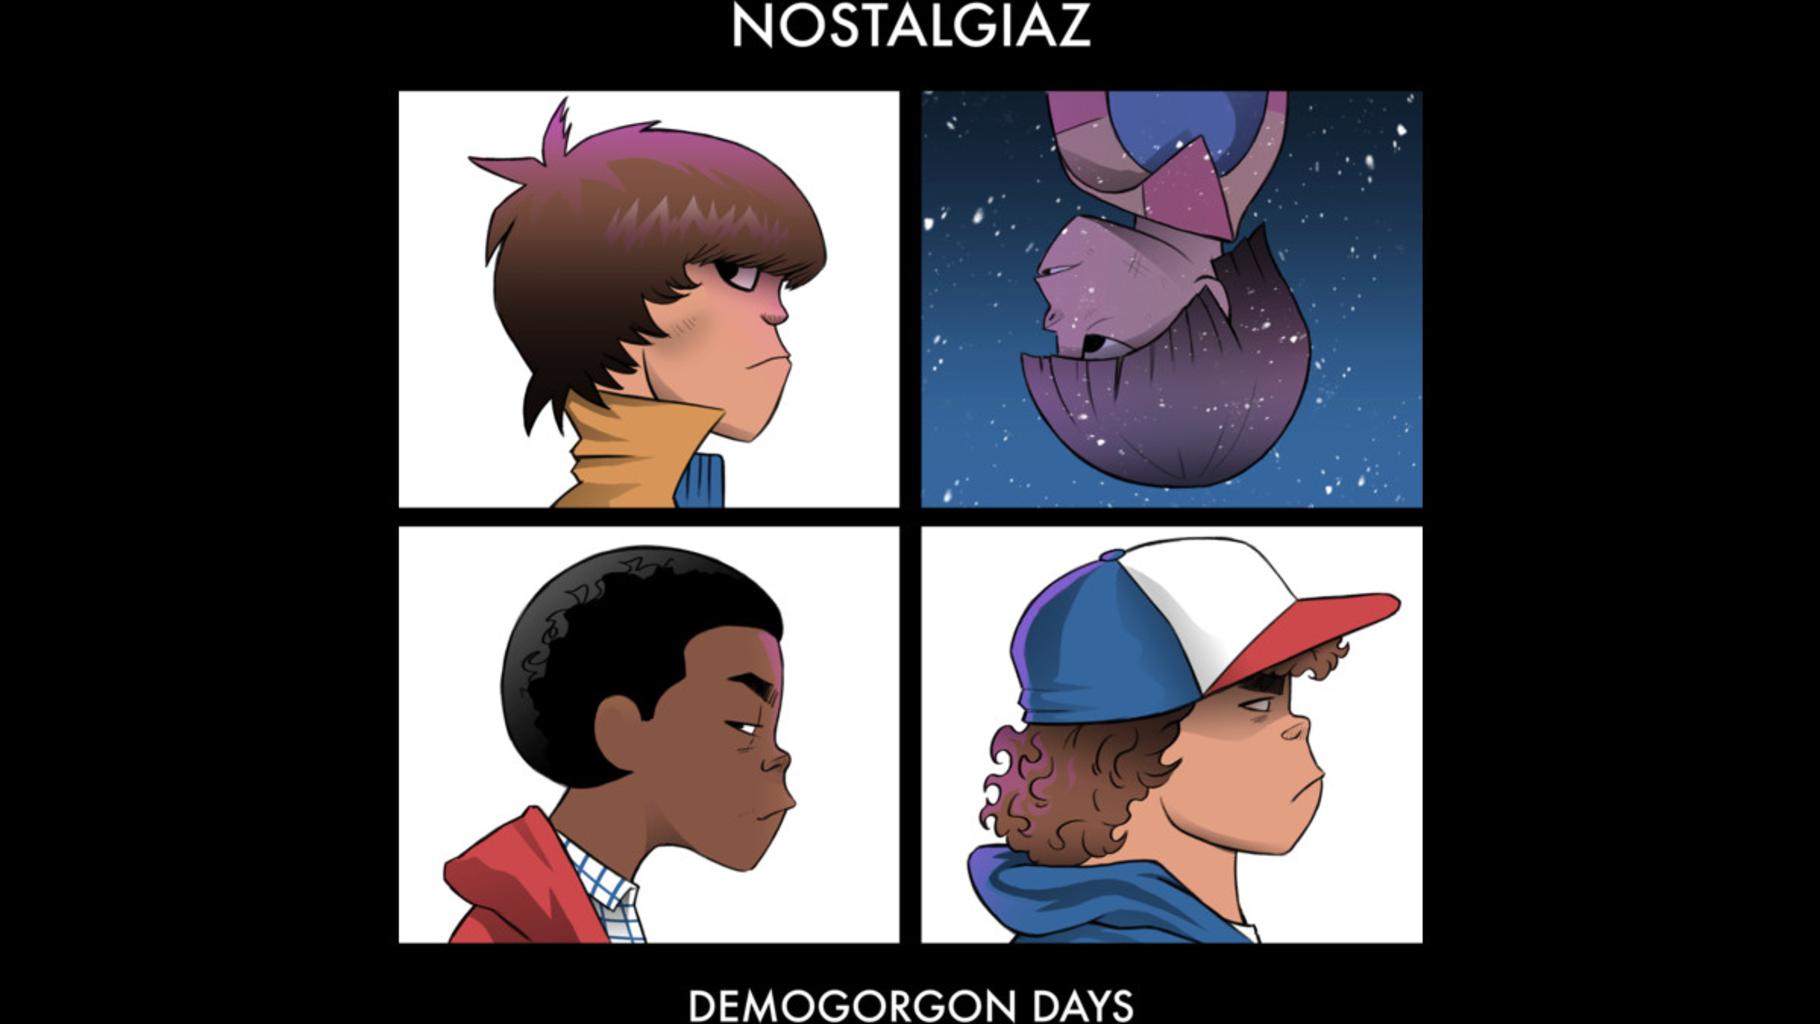 Design by Humans: Demogorgon Days